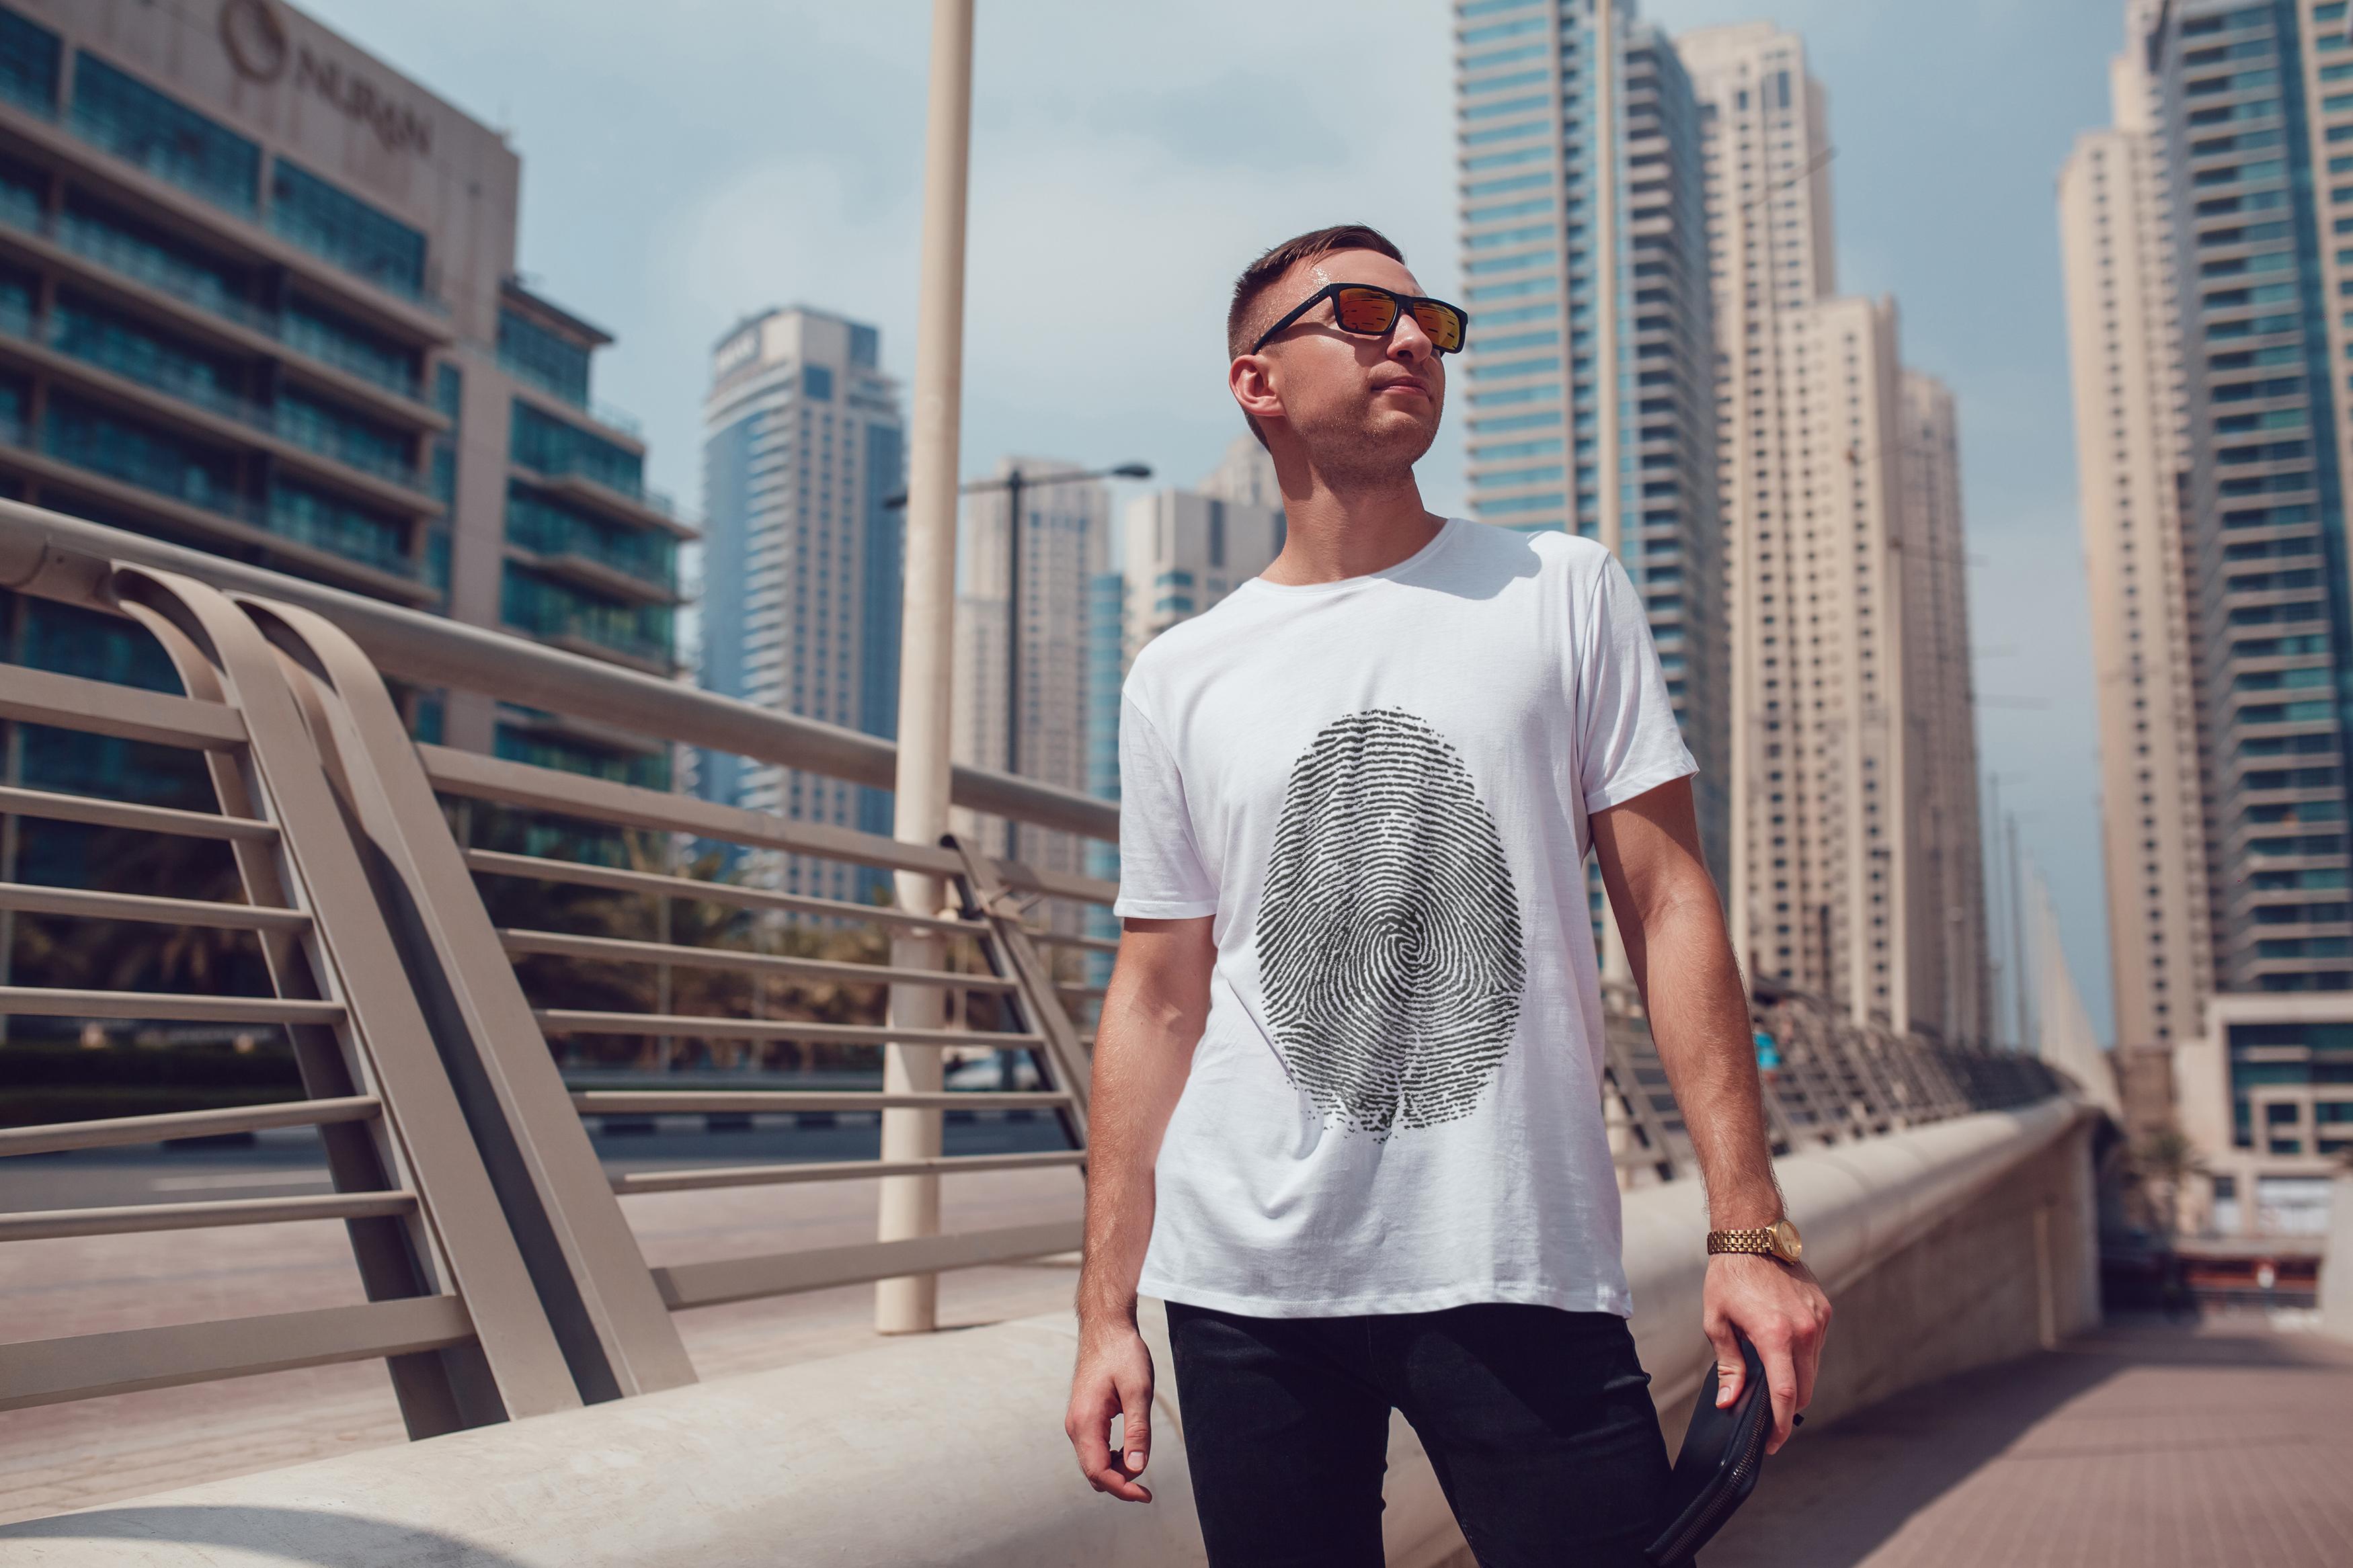 Men's T-Shirt Mock-Up Vol.5 2017 example image 15